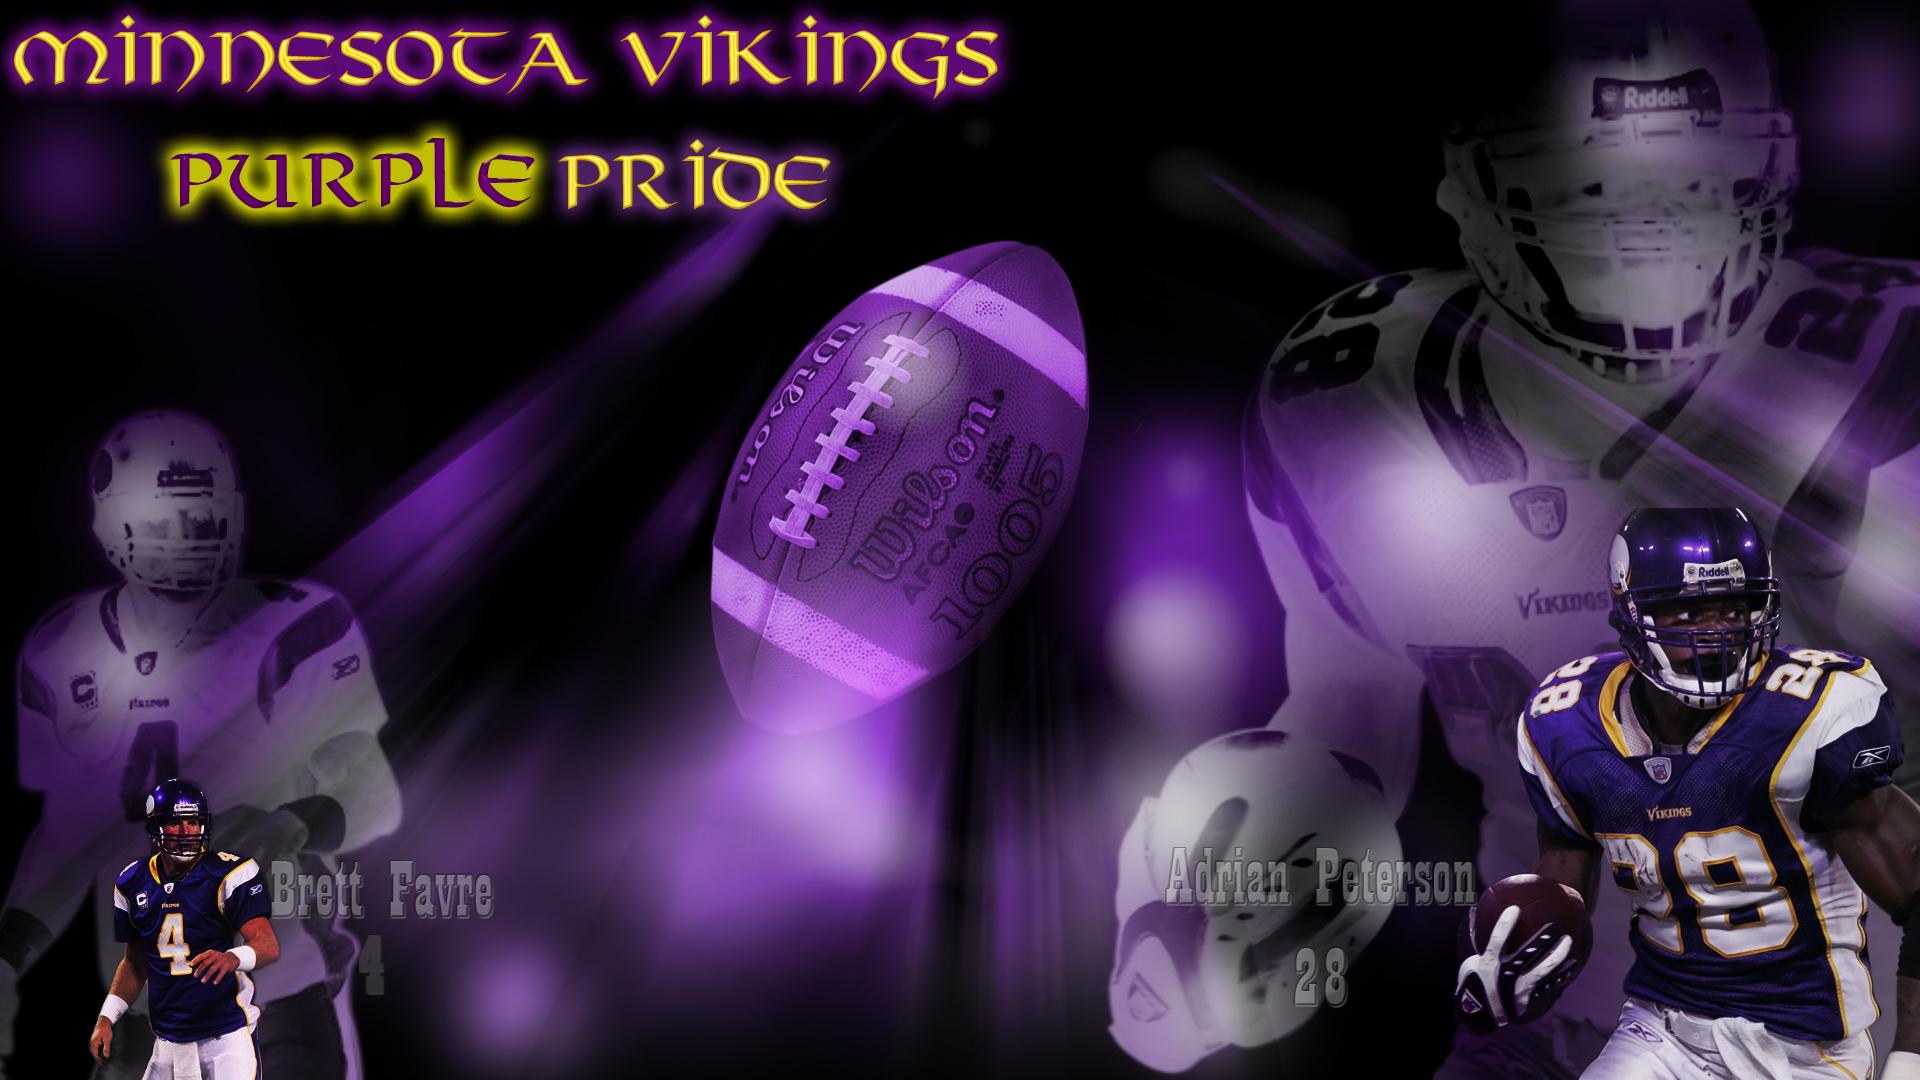 Bacardee Vikings Minnesota Posted wallpapers HD   132725 1920x1080